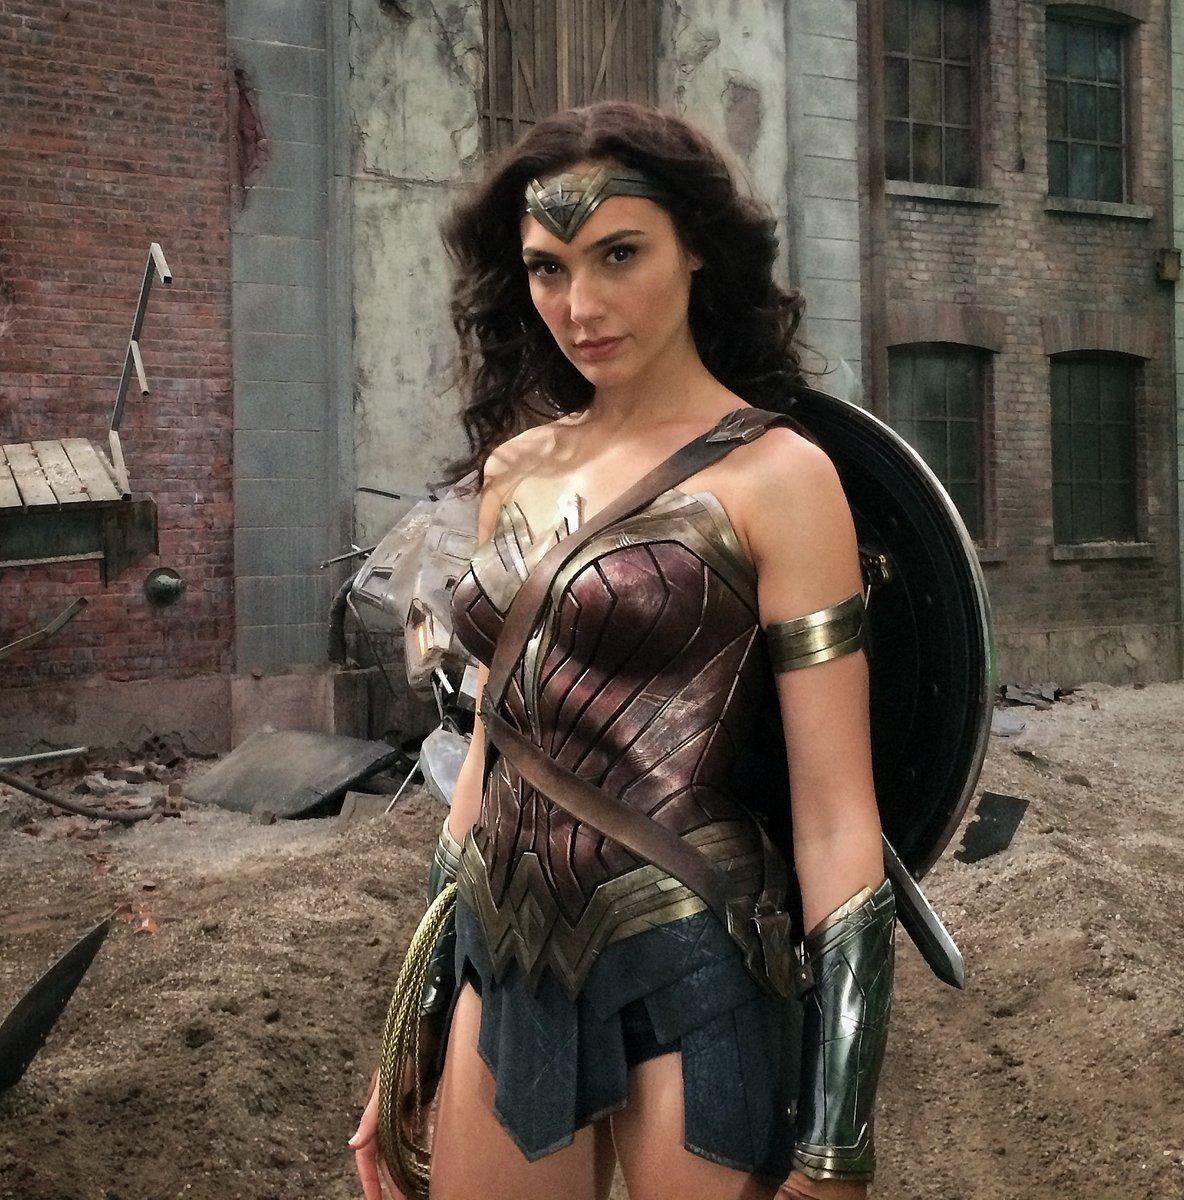 Wonder Woman (Gal Gadot) | Batman Wiki | FANDOM powered by Wikia